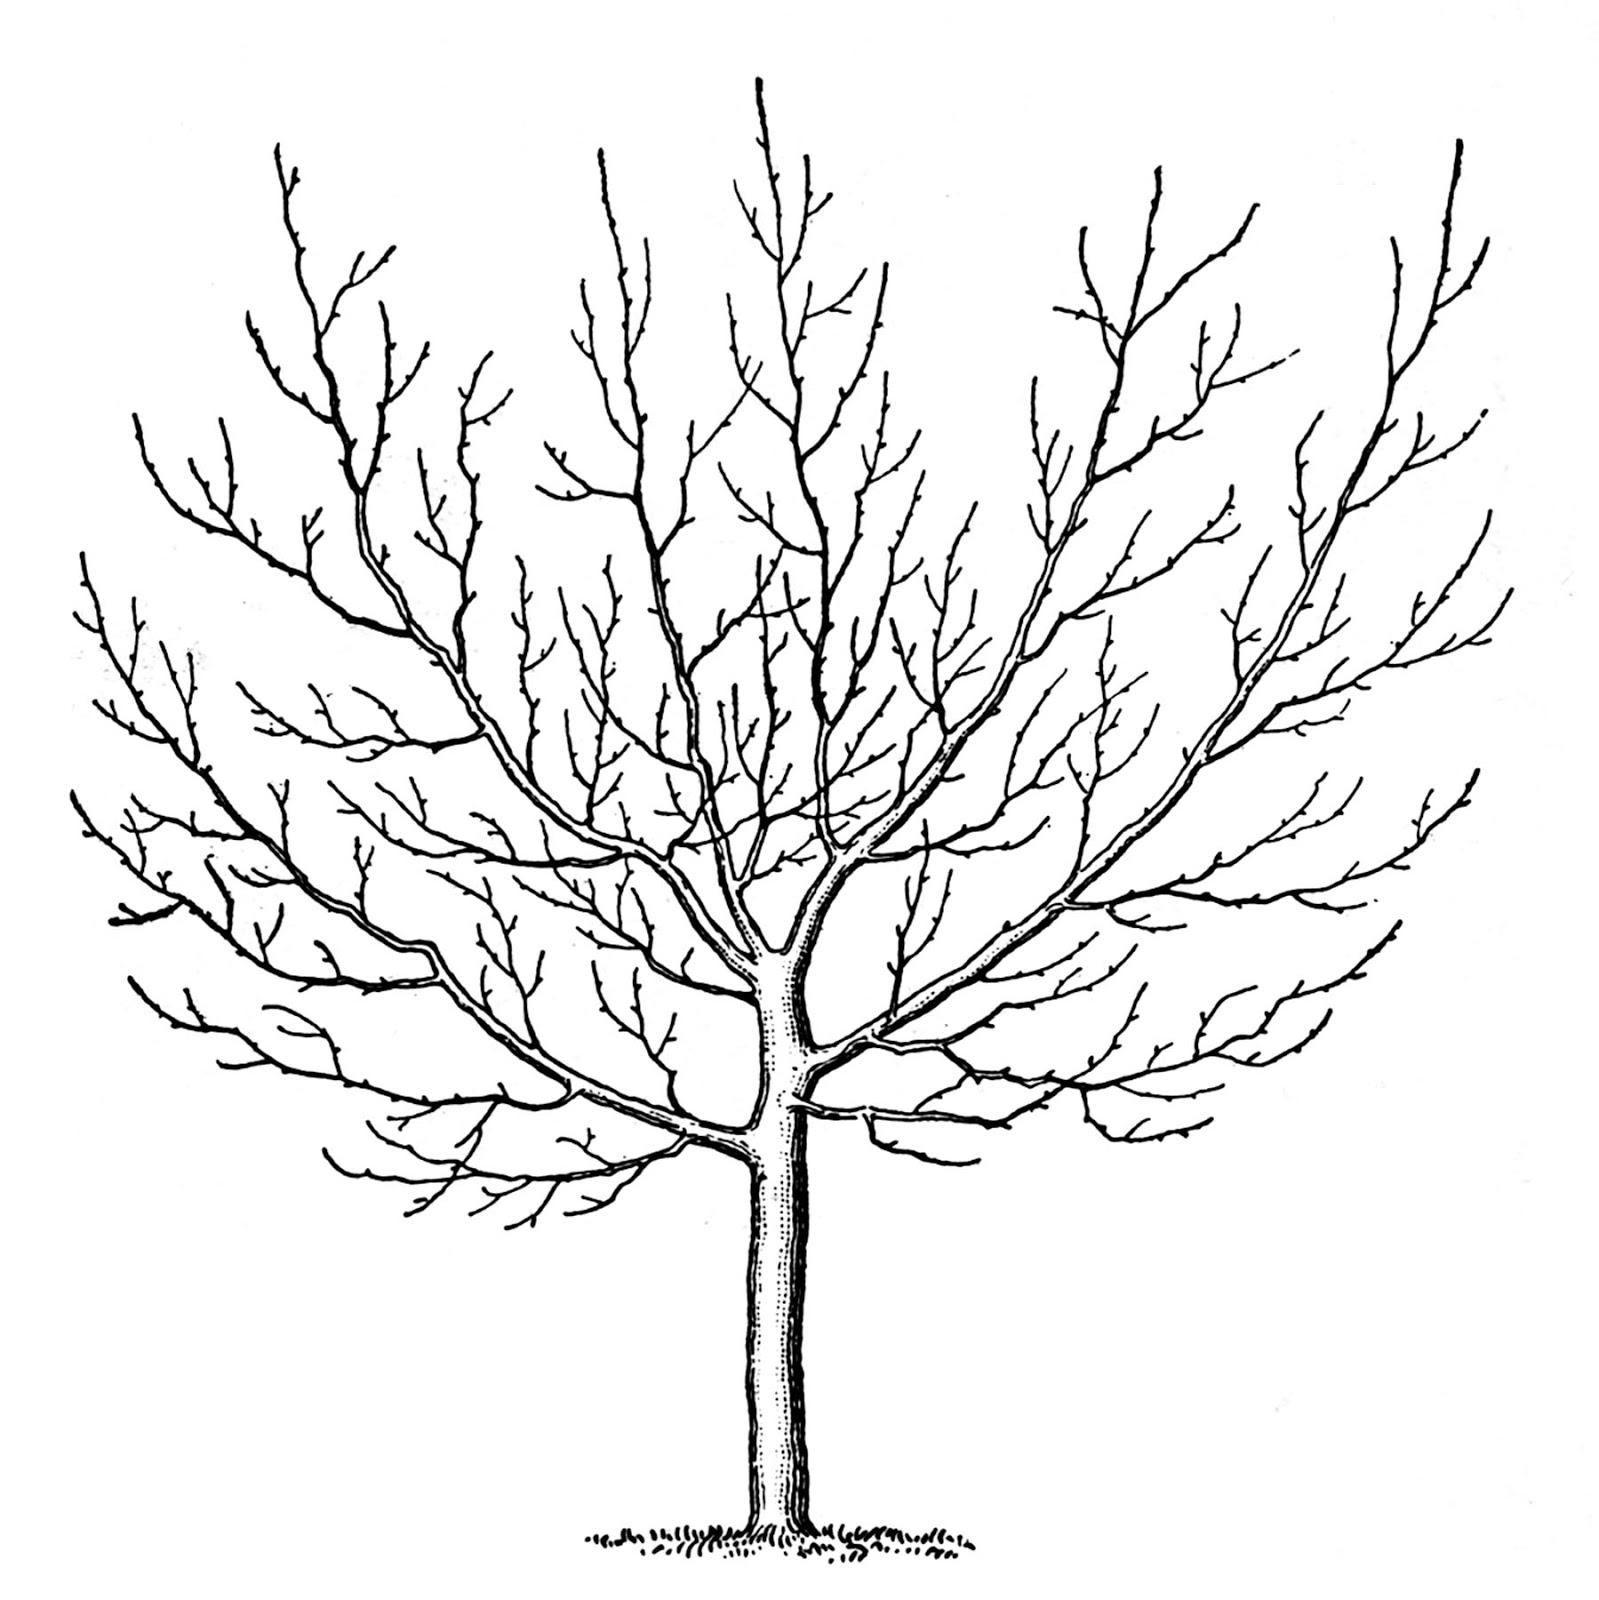 Clipart woman dancing around tree jpg free stock Clipart woman dancing around tree - Clip Art Library jpg free stock